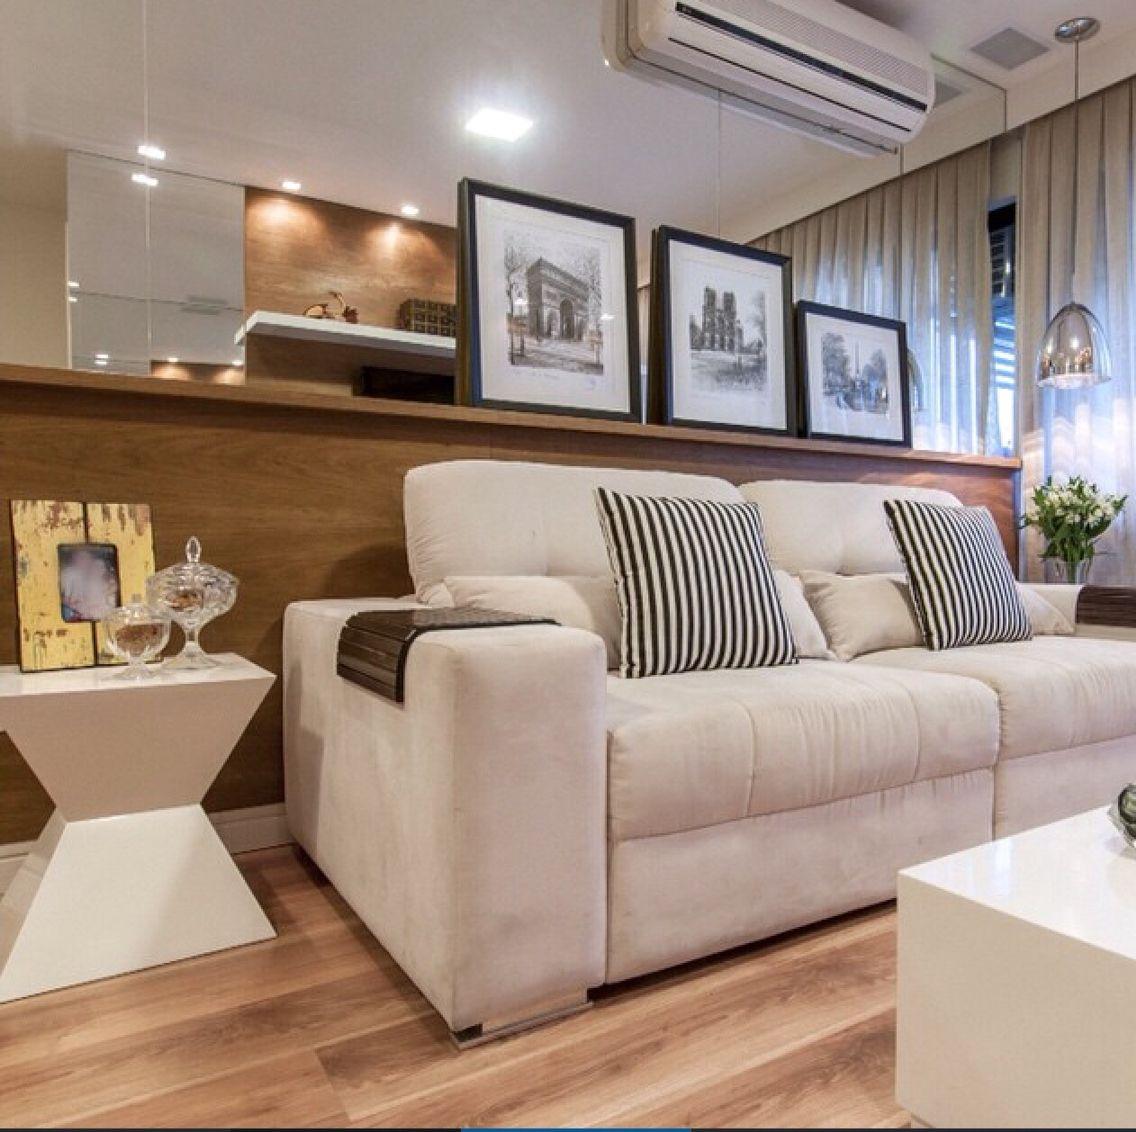 Studiosantarosa sala pinterest salas de tv for Sillones para apartamentos pequenos